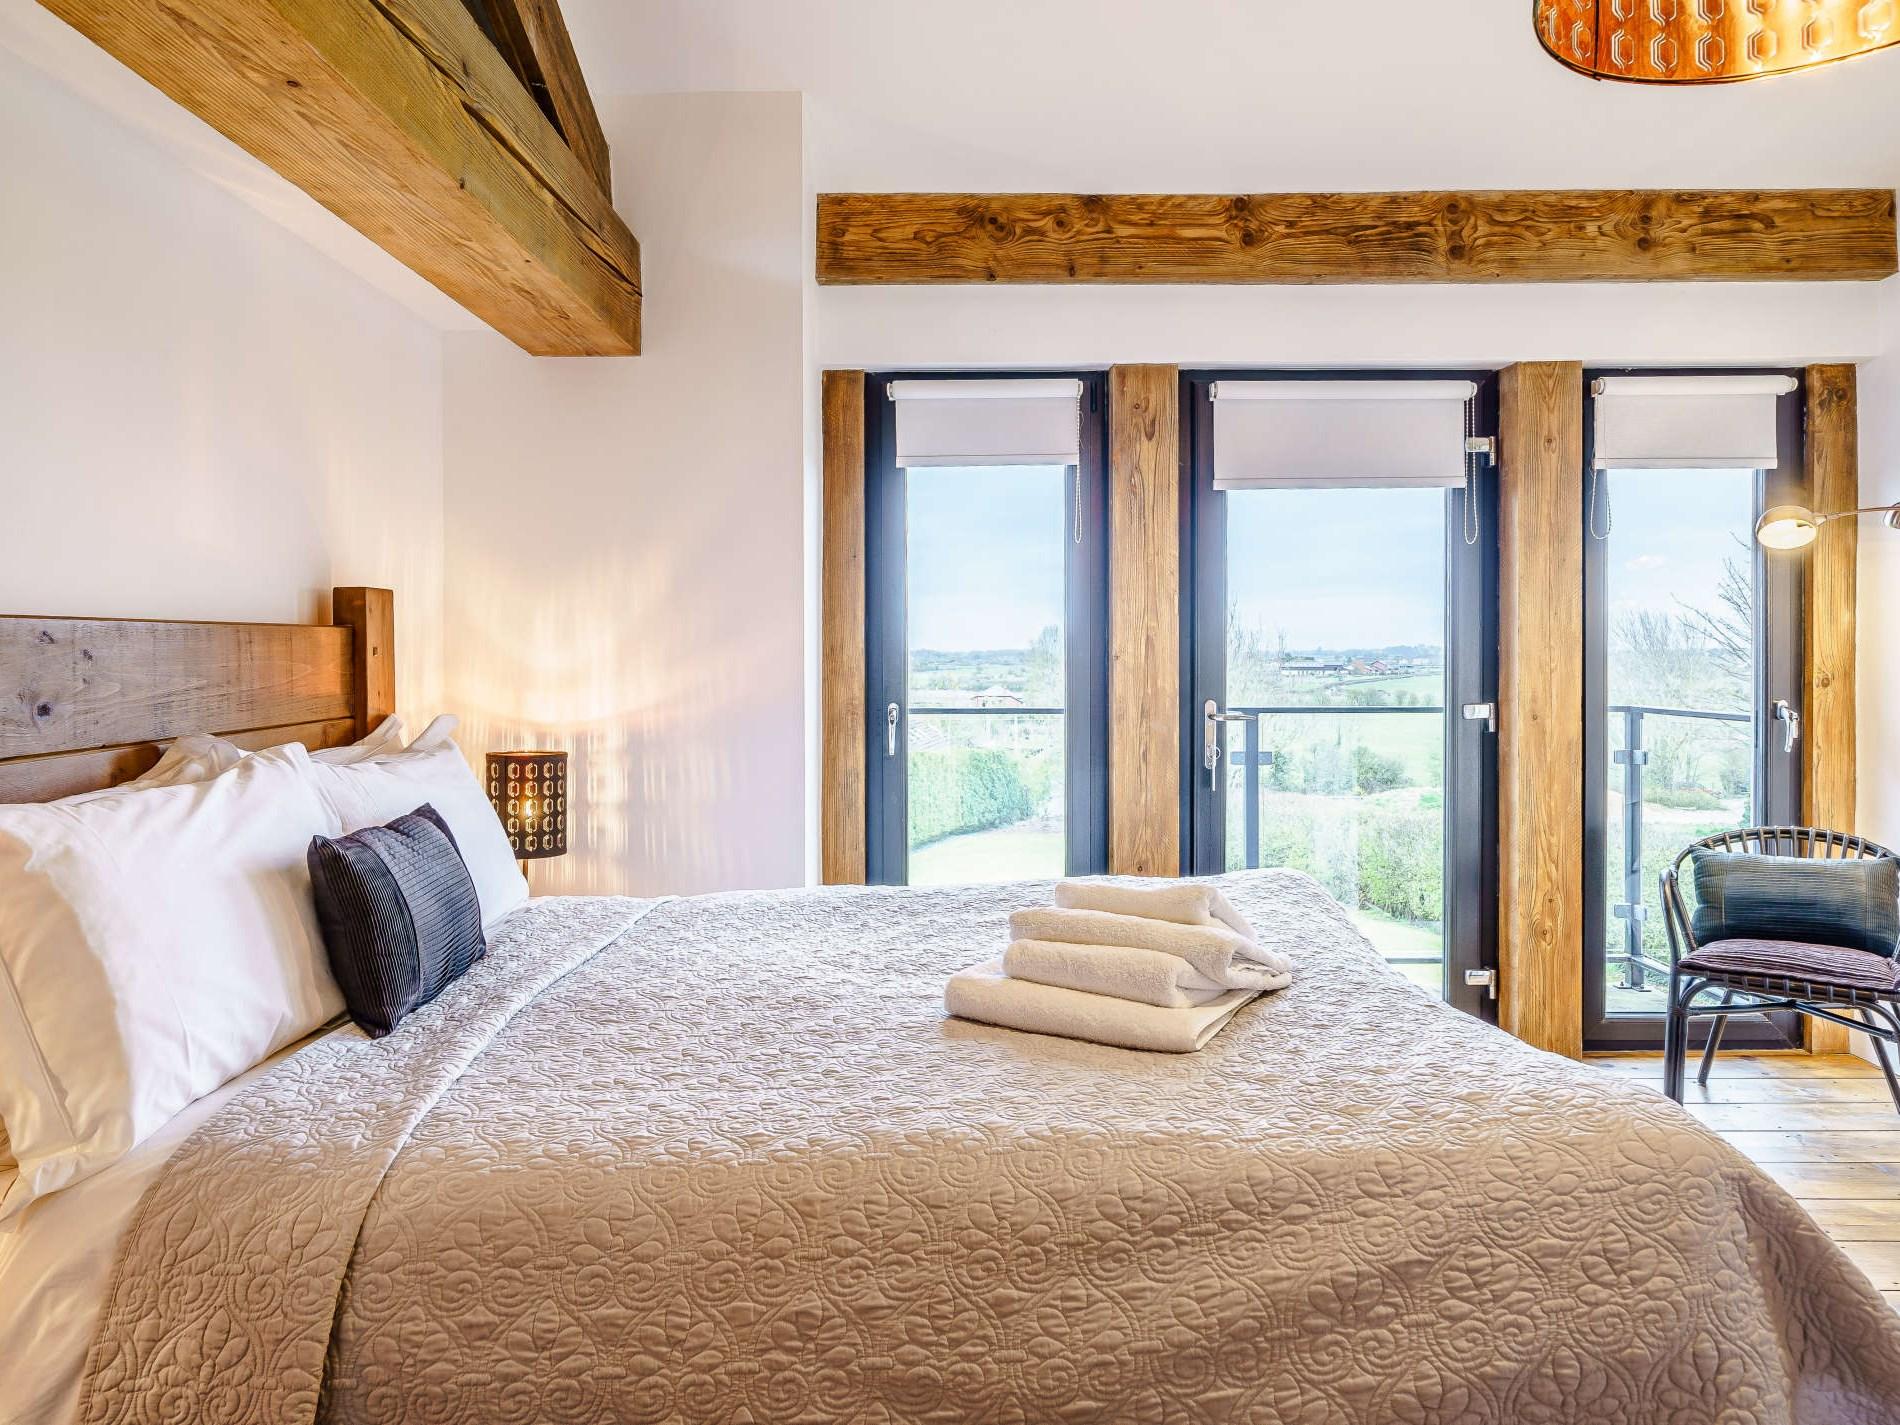 4 Bedroom Barn in Lancashire, Yorkshire Dales